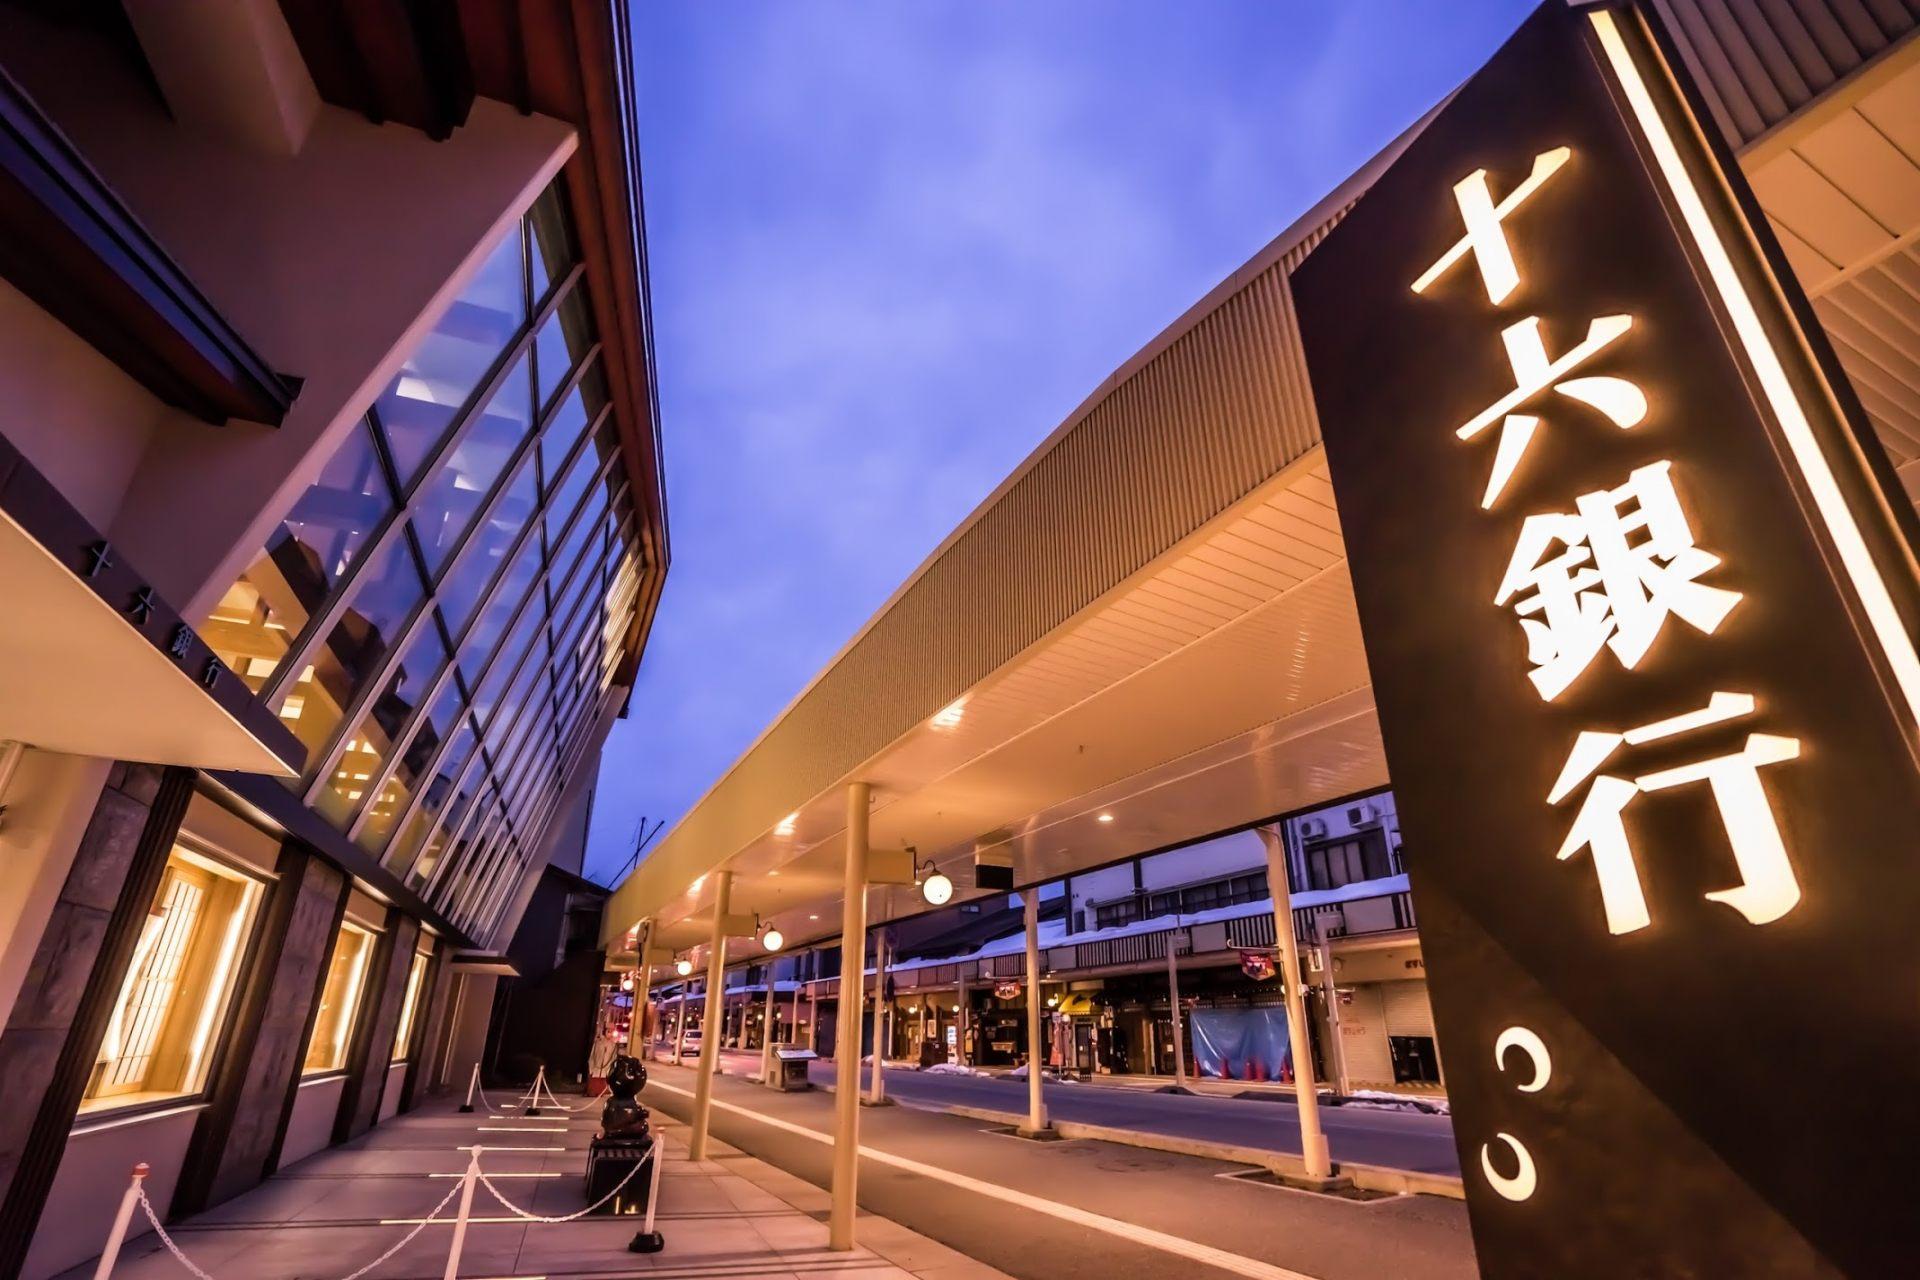 Takayama branch of Juroku Bank